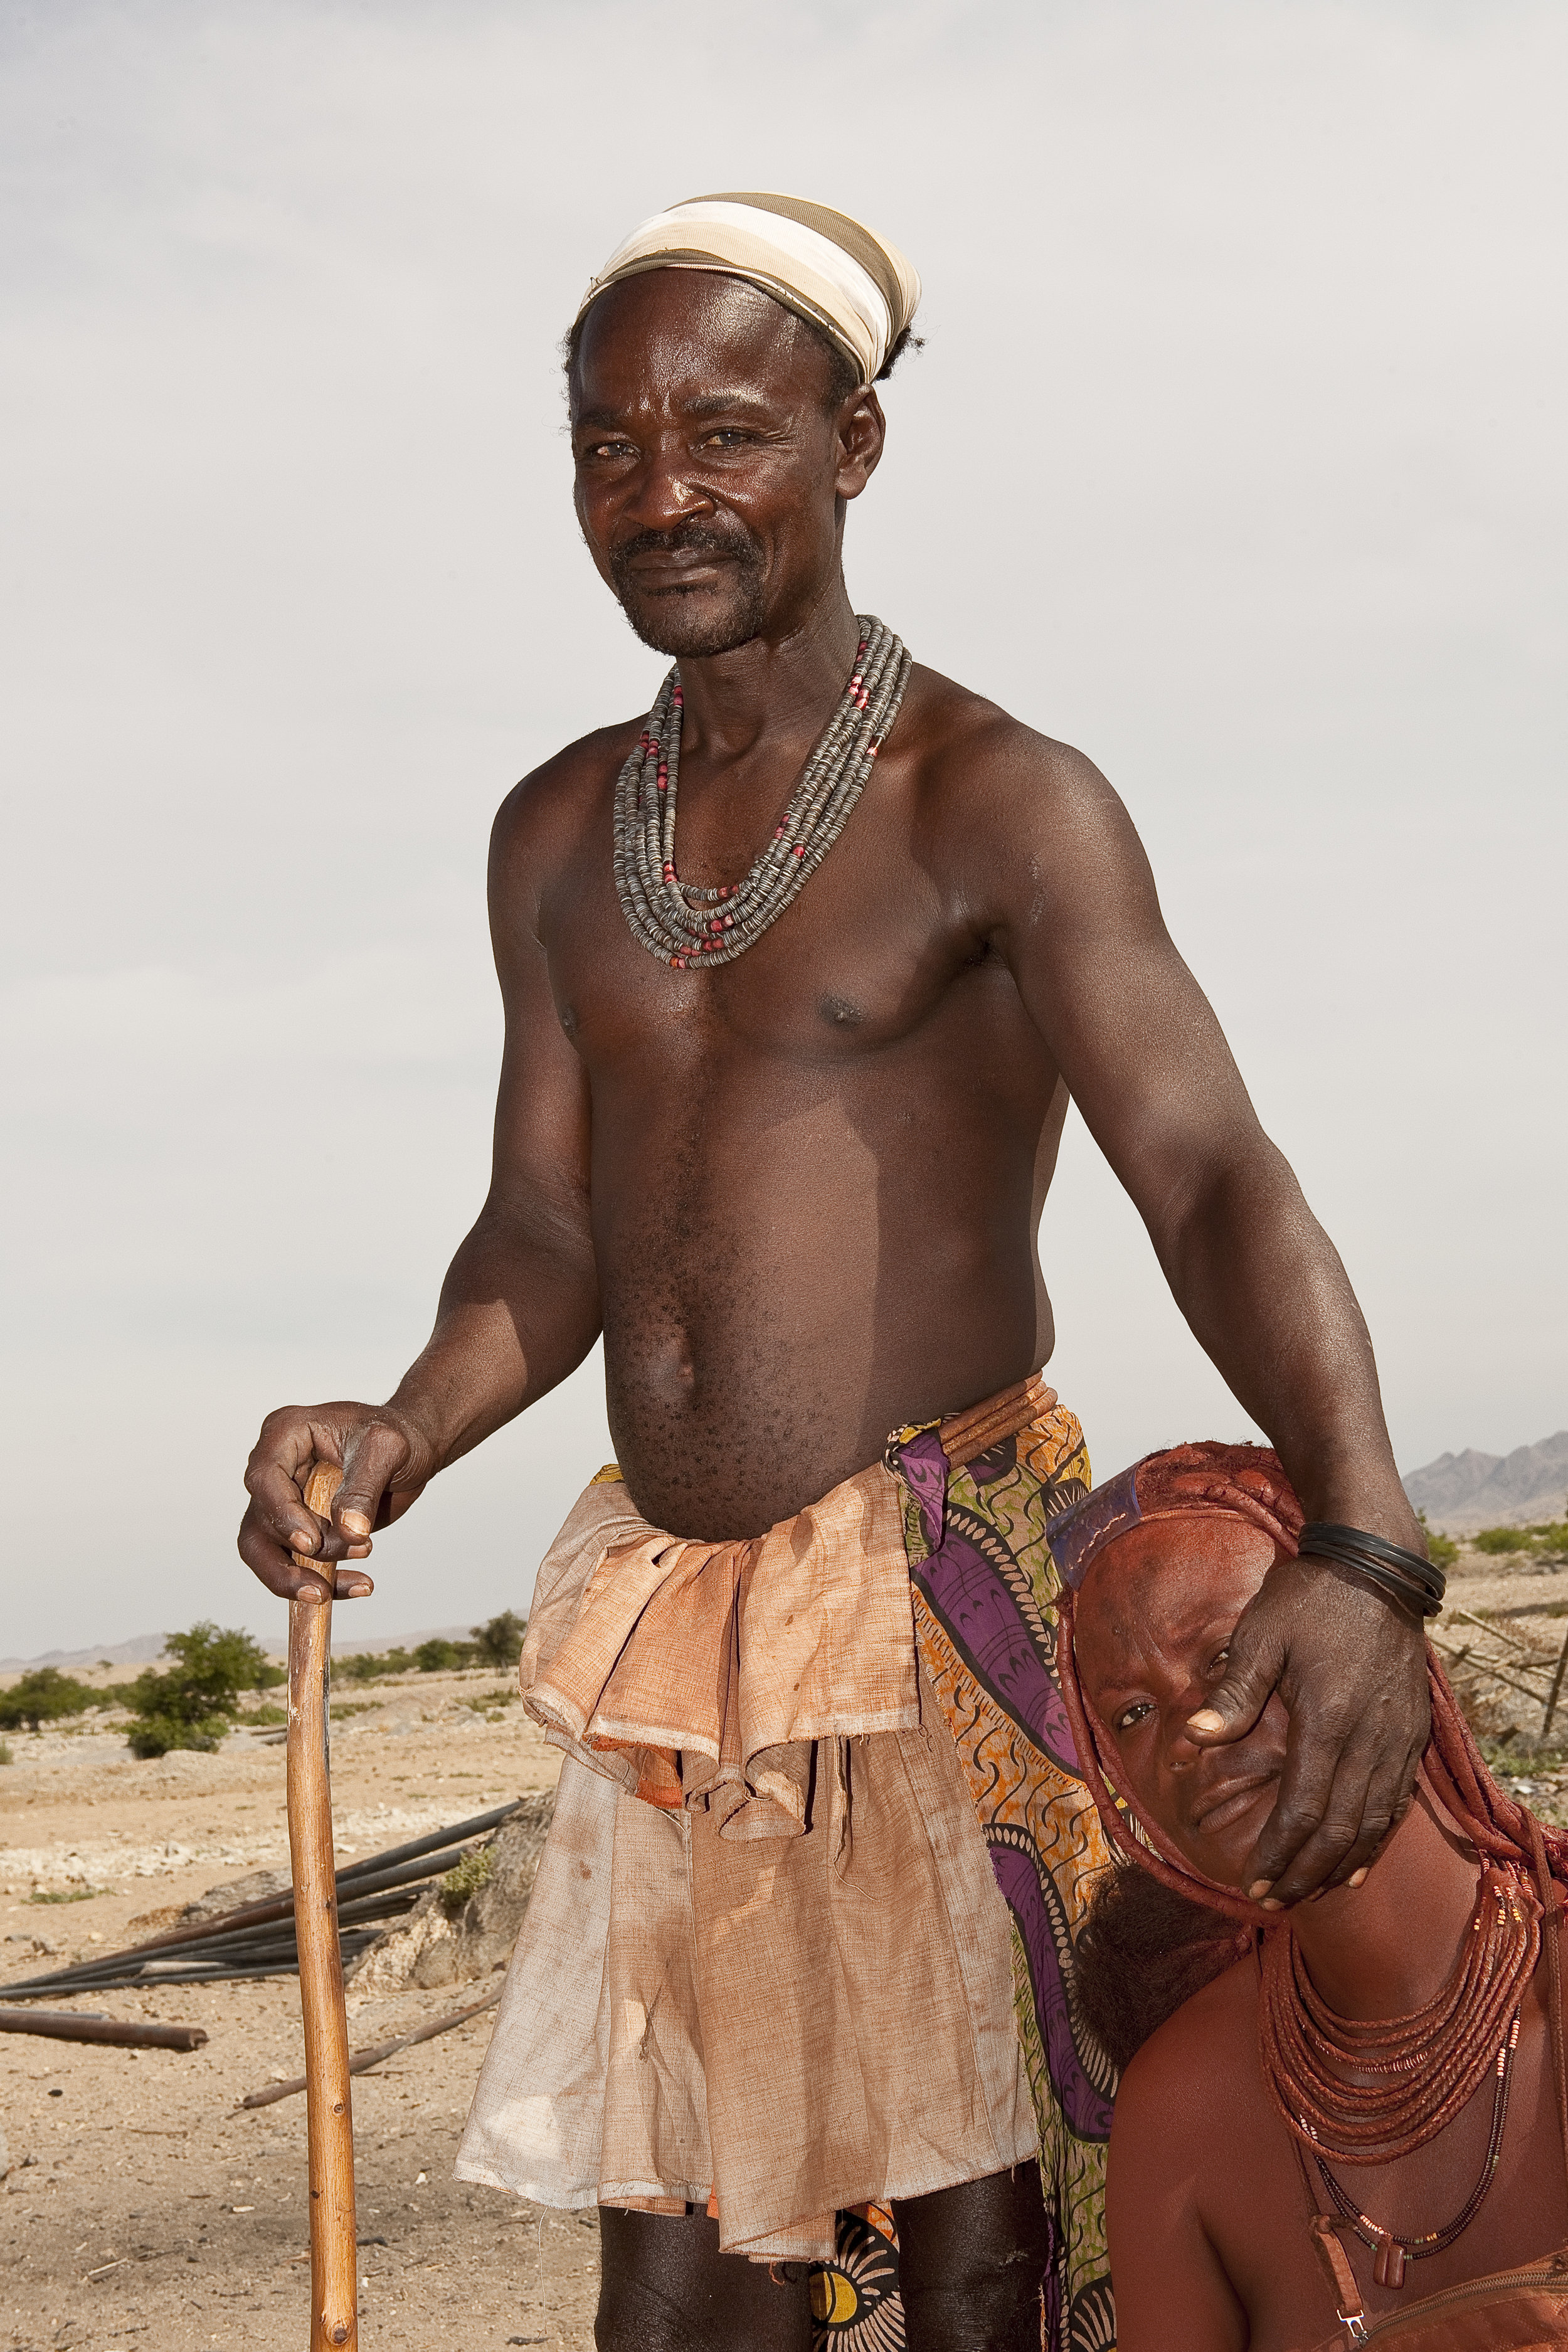 Namibia for LXRY-magazine